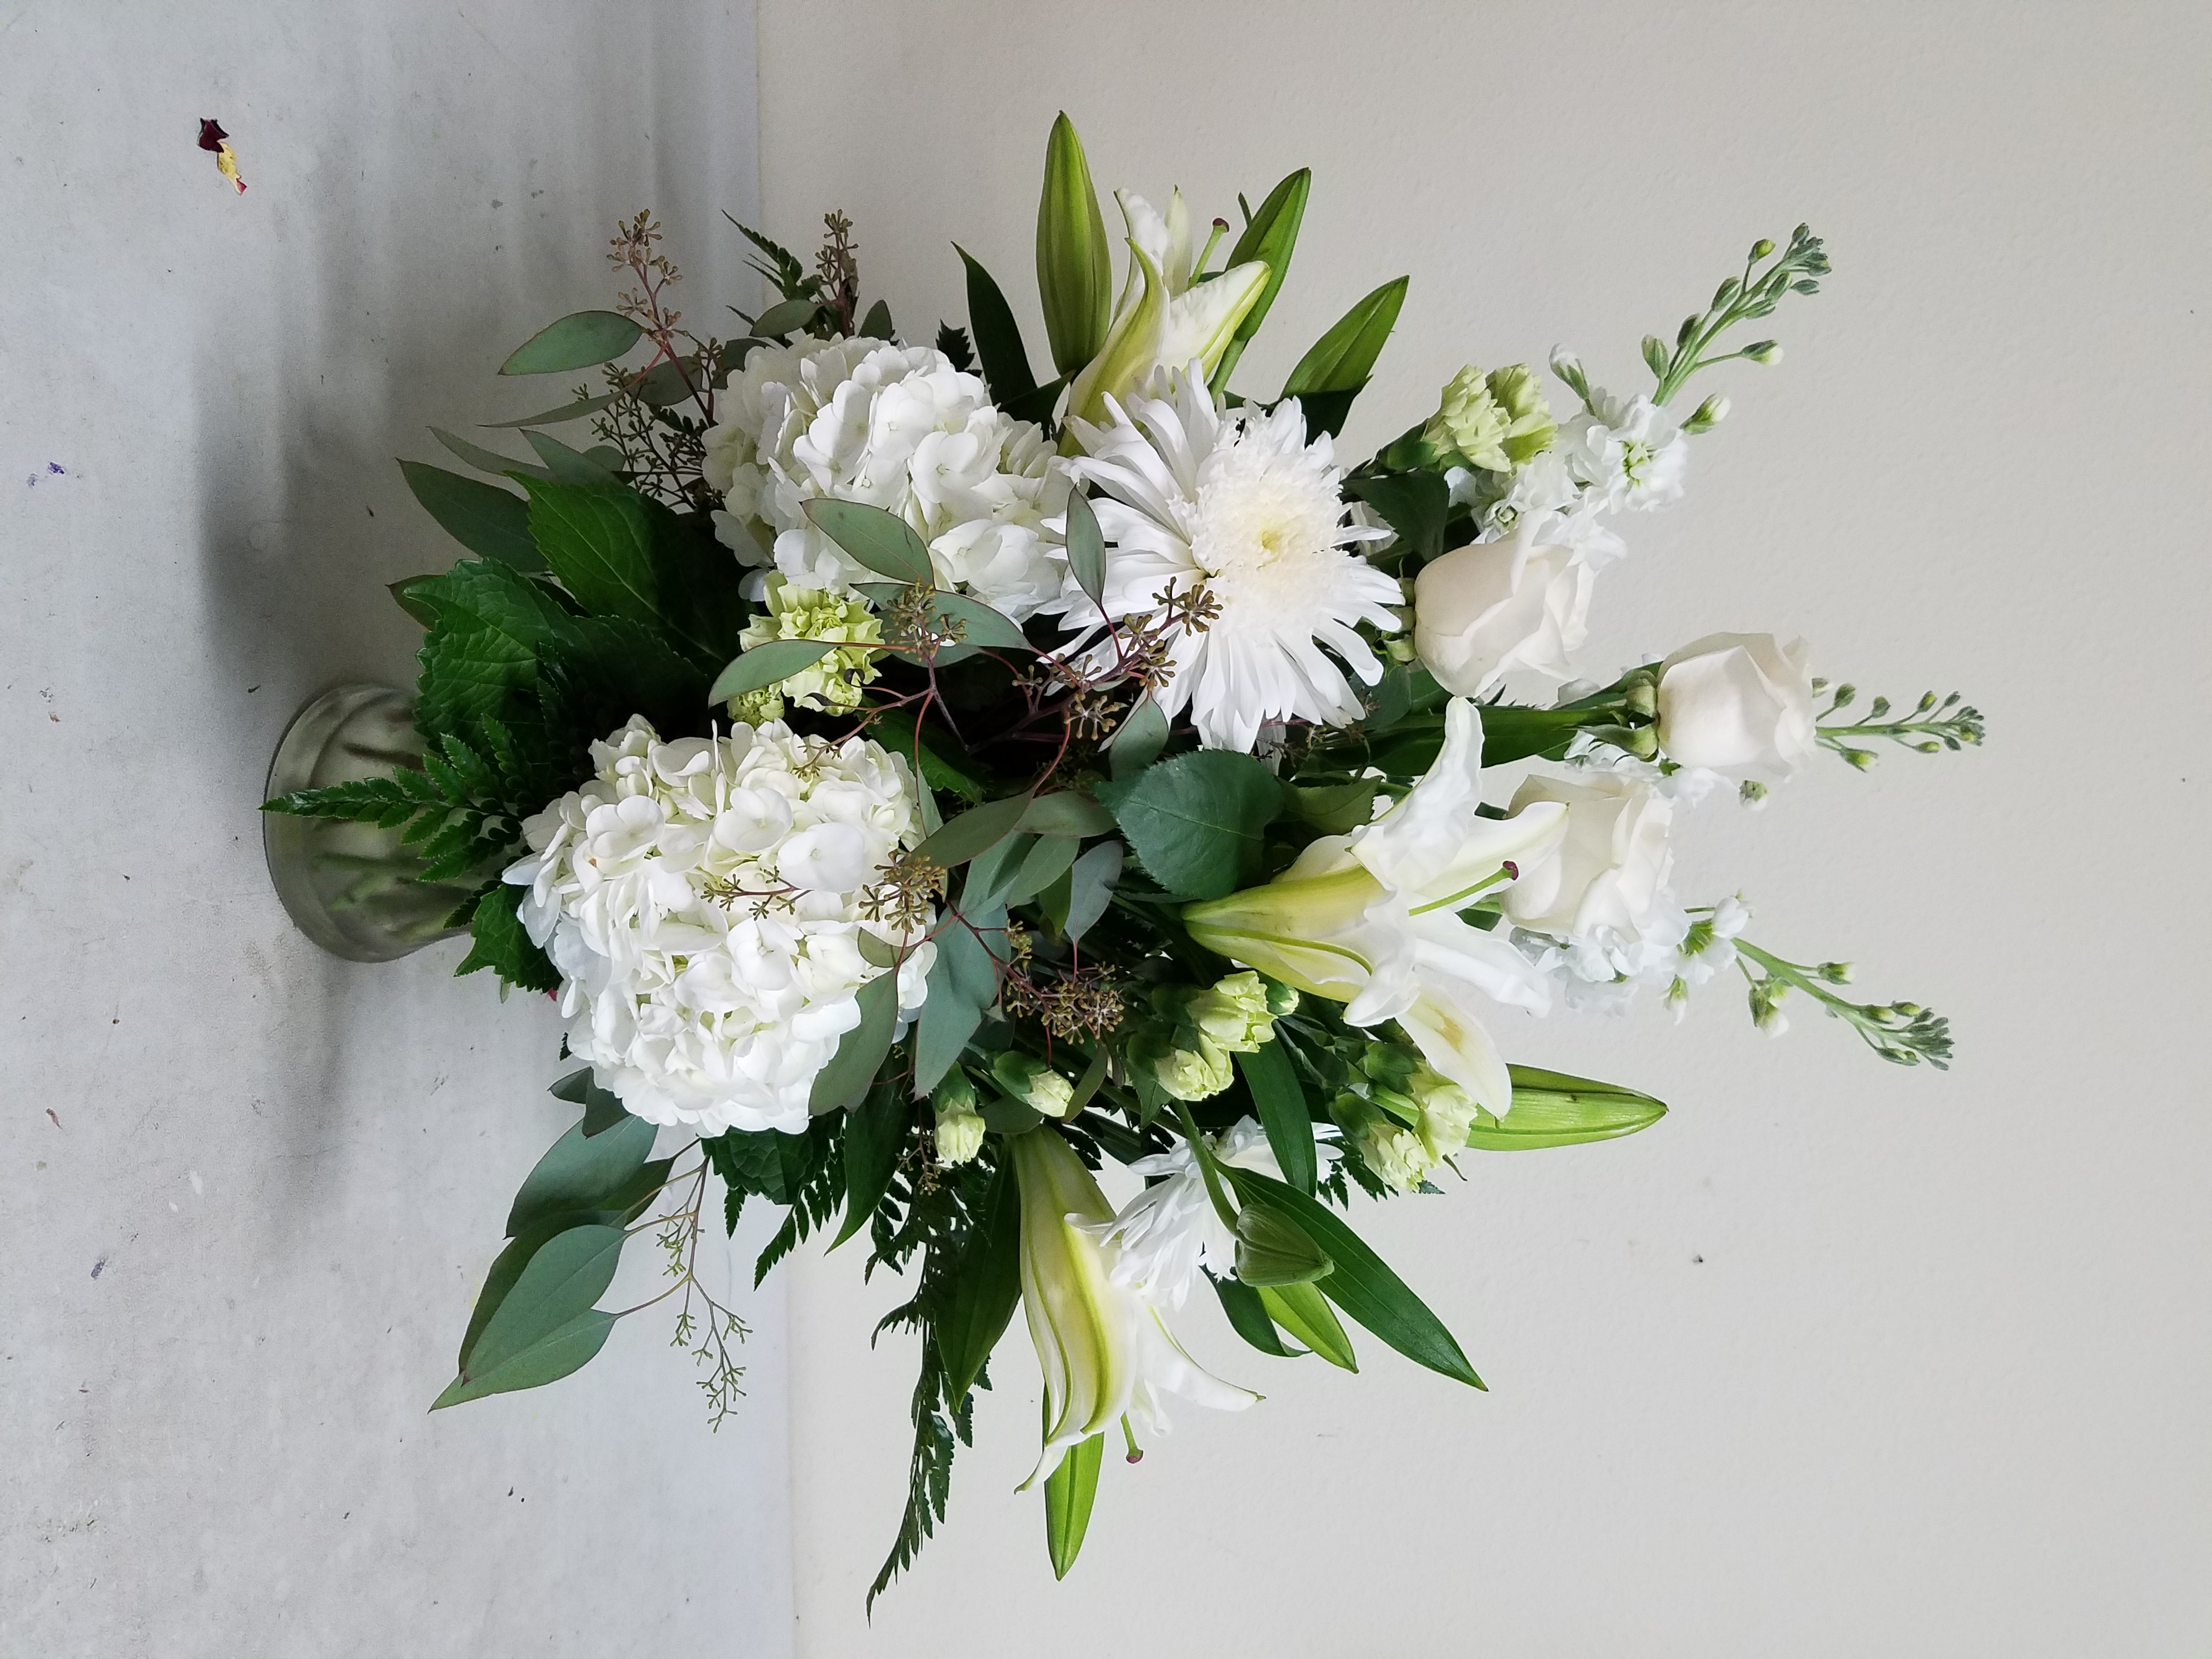 Elegant White Arrangement No. 2